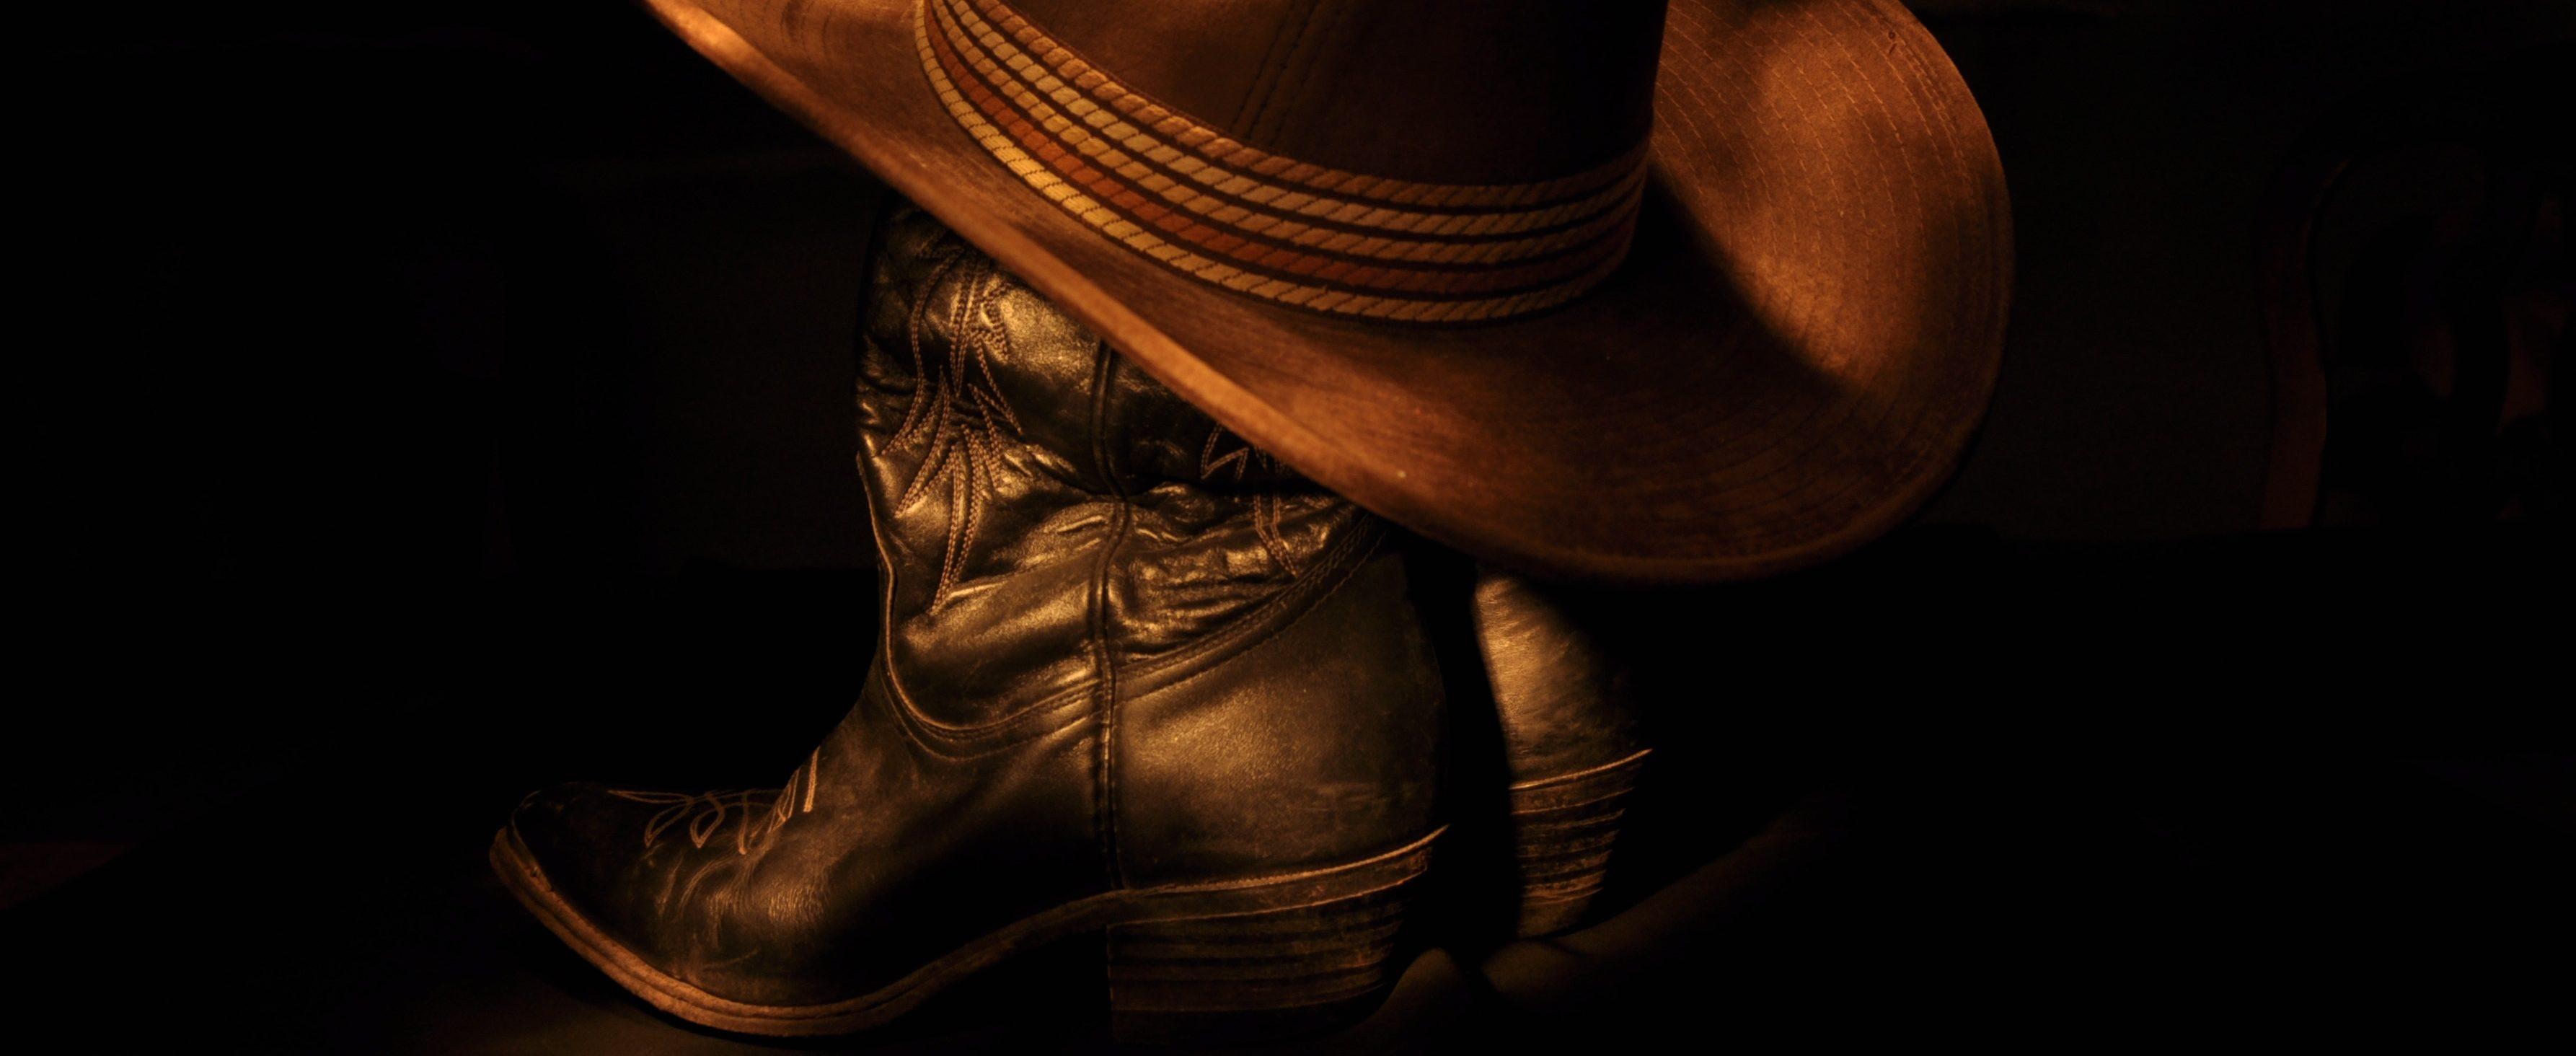 b2a51b61f0e Fancy Gun Cowboy Western Blog | Cheap Exotic Cowboy Boots Online Sale